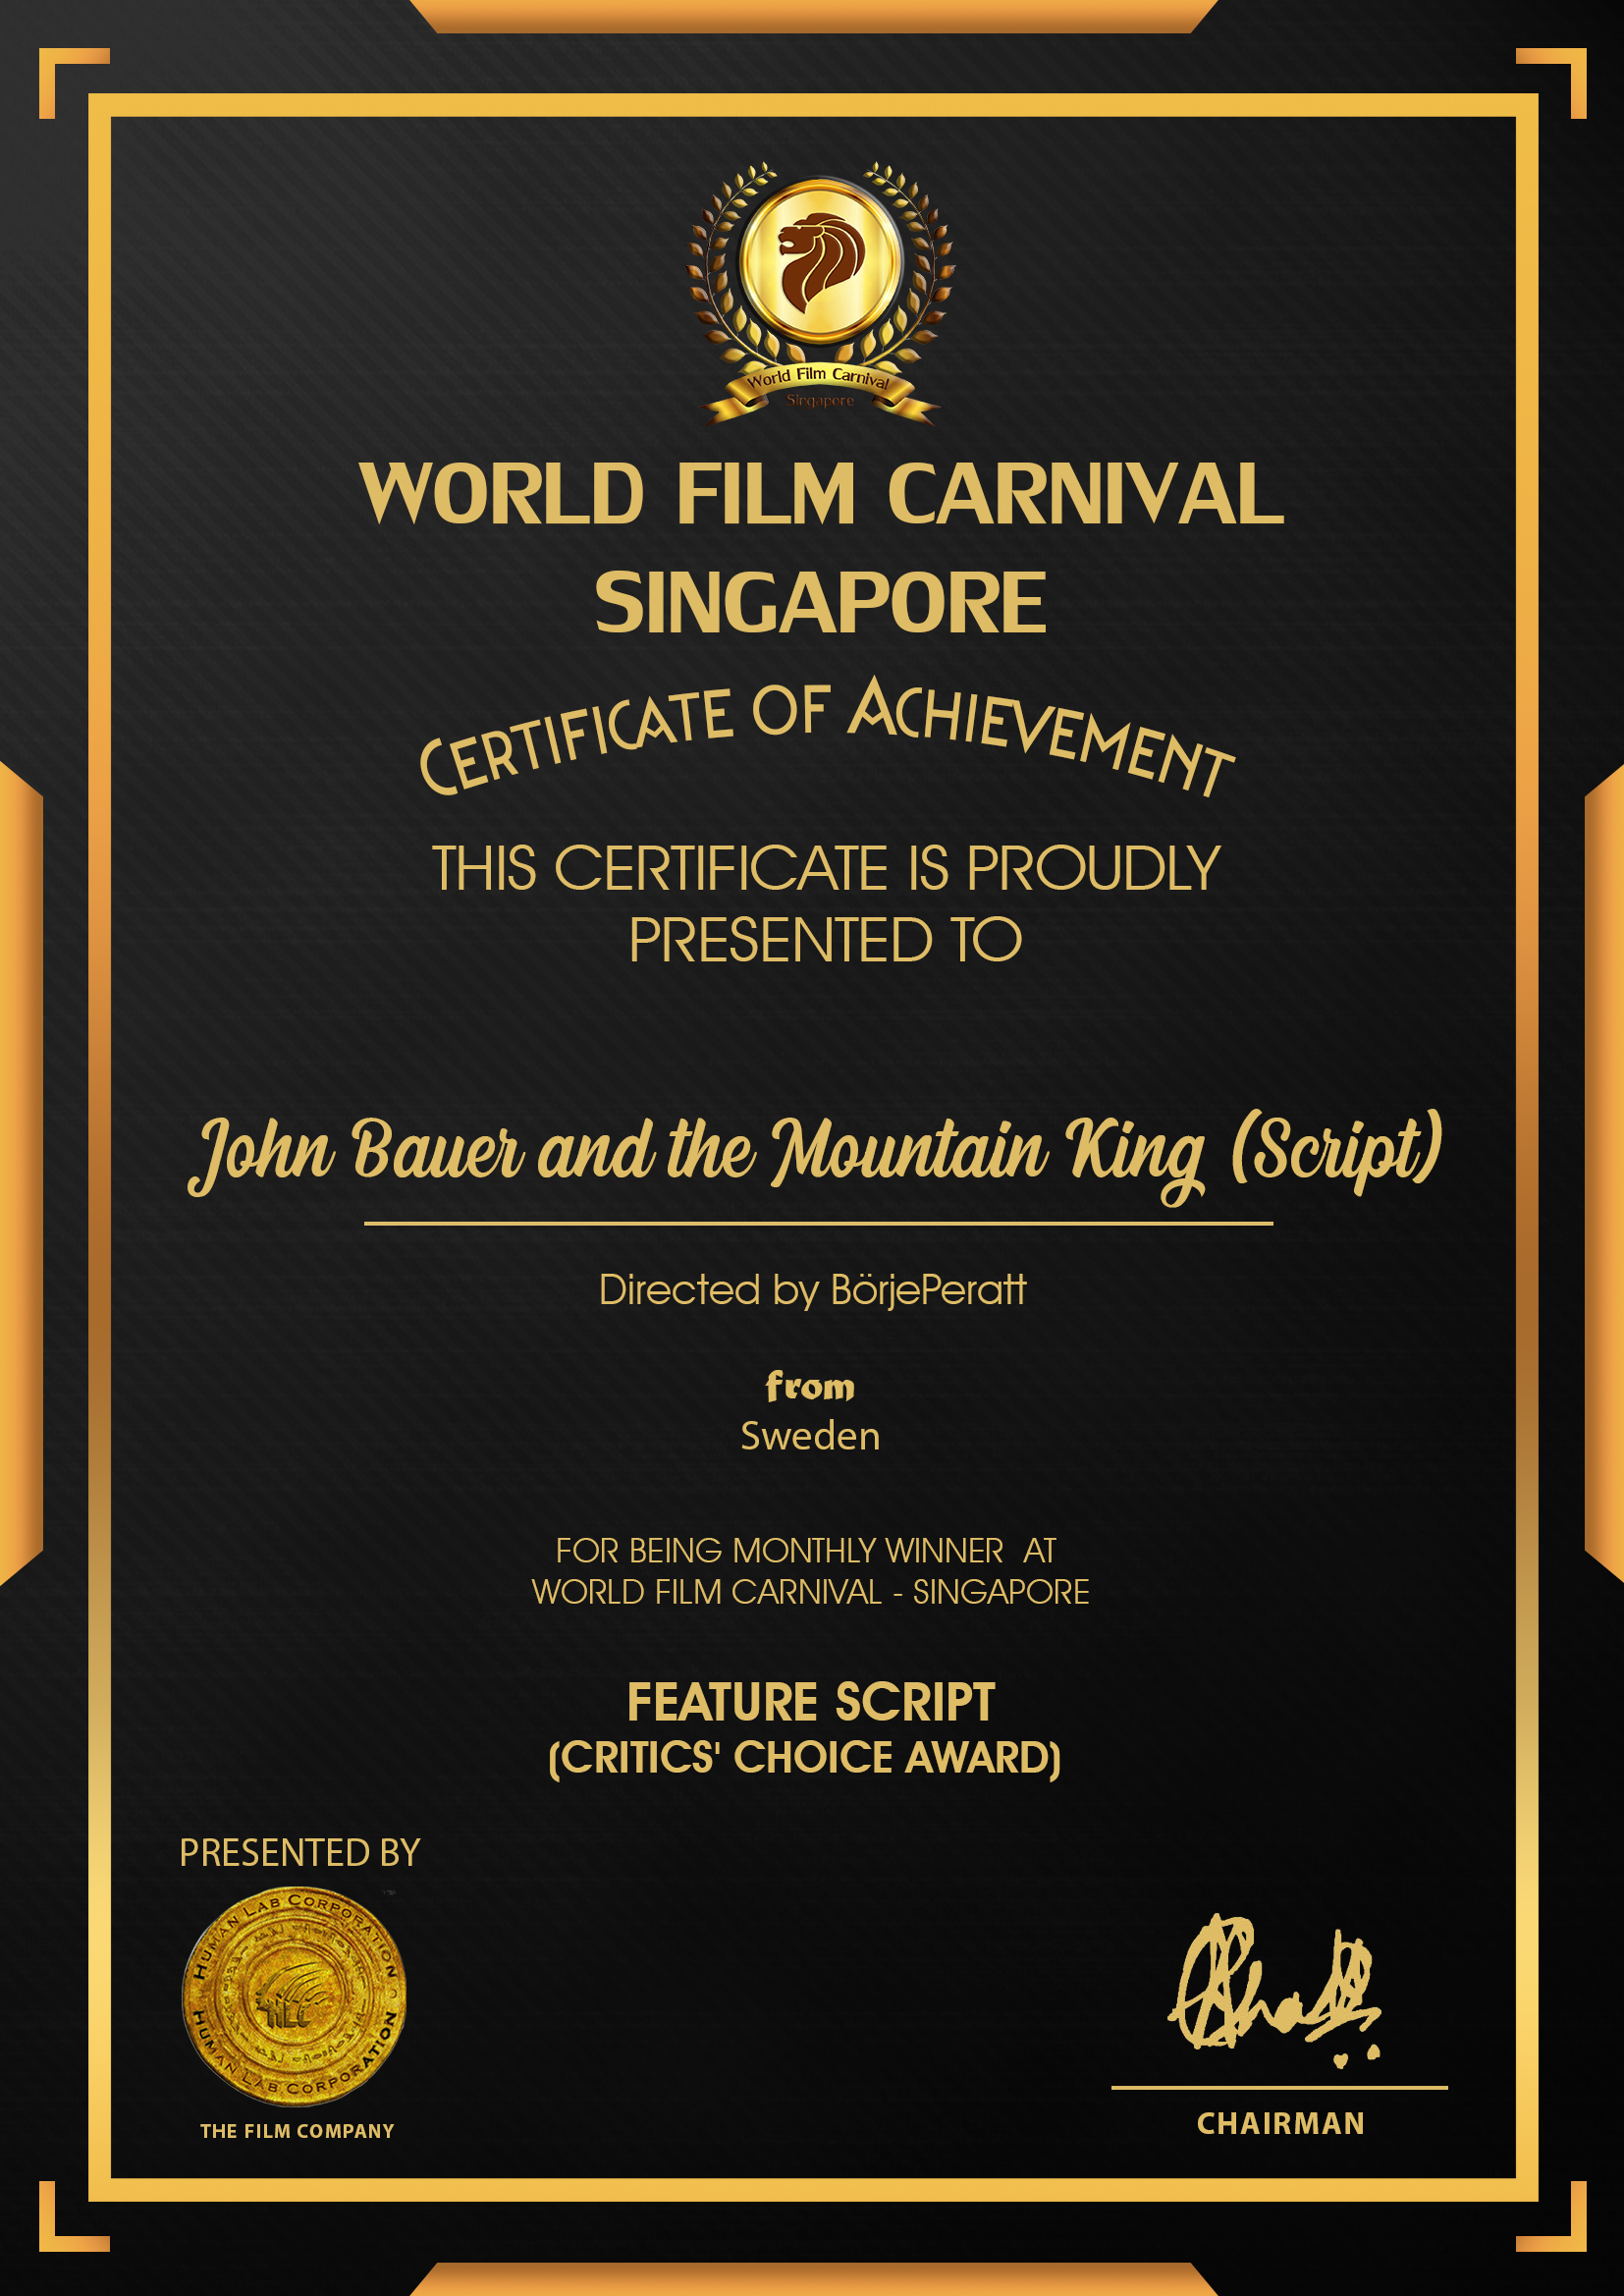 John Bauer and the Mountain King (Script)_WINNER Certificat of Achievement Börje Peratt